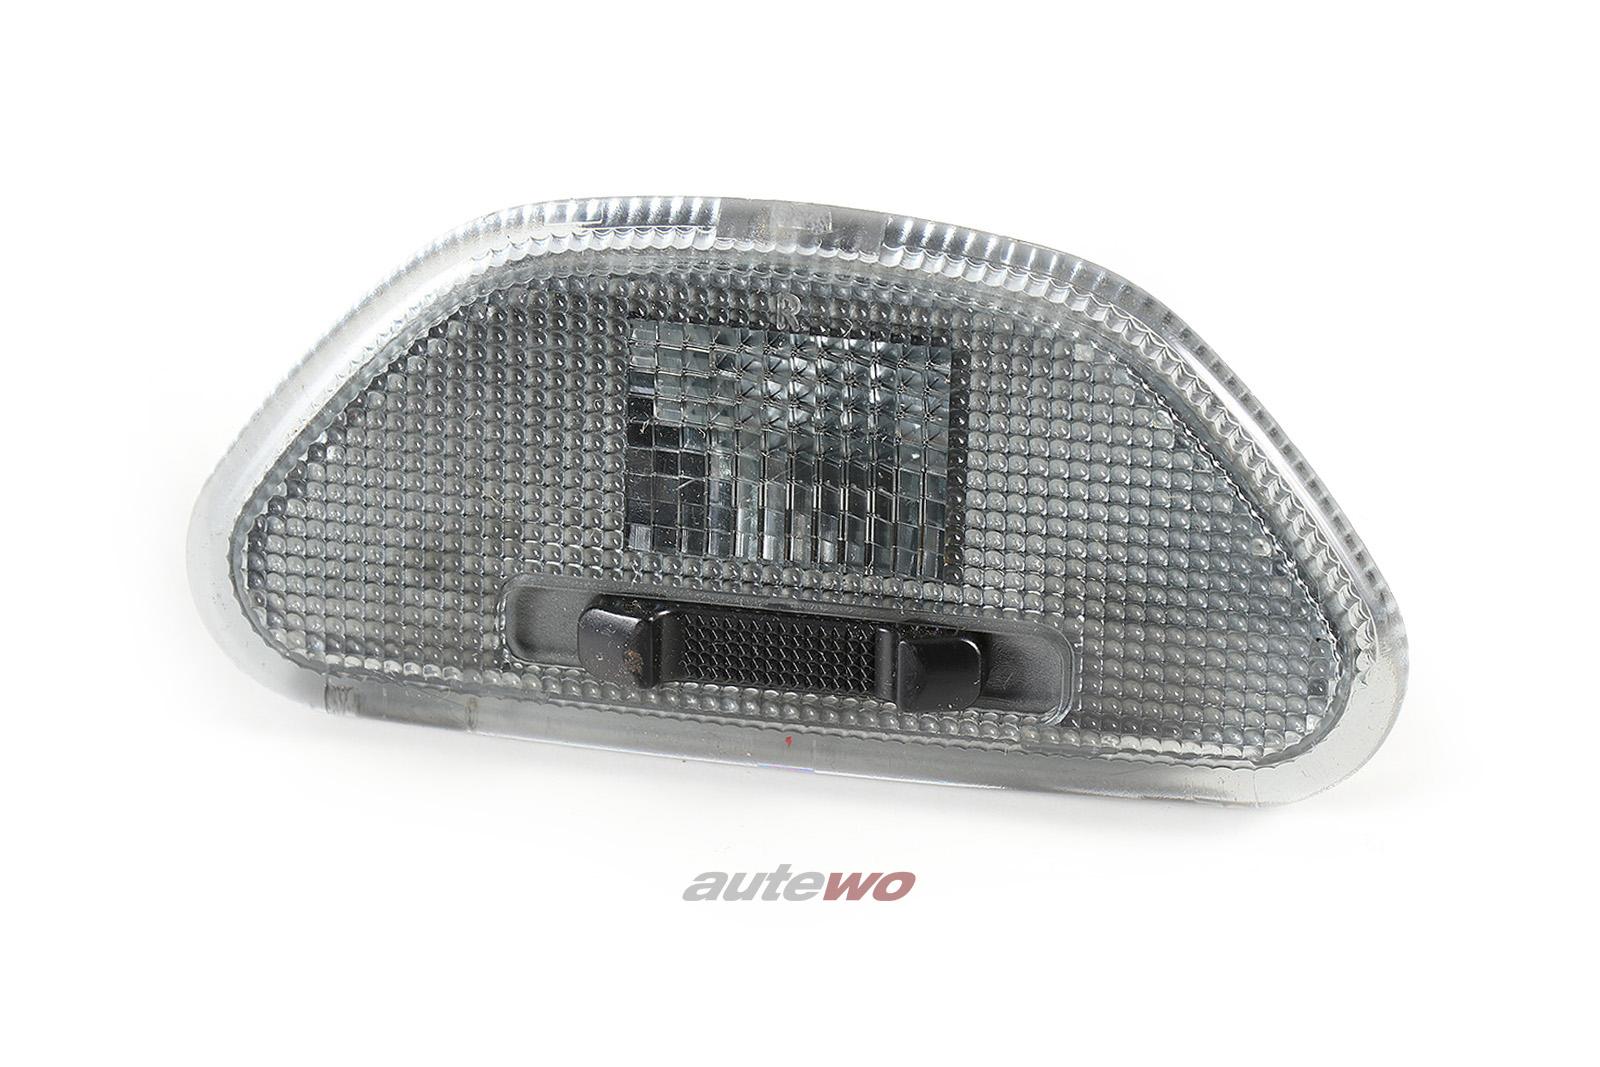 8D9947112 Audi A4 B5 Avant Innen- und Leseleuchte